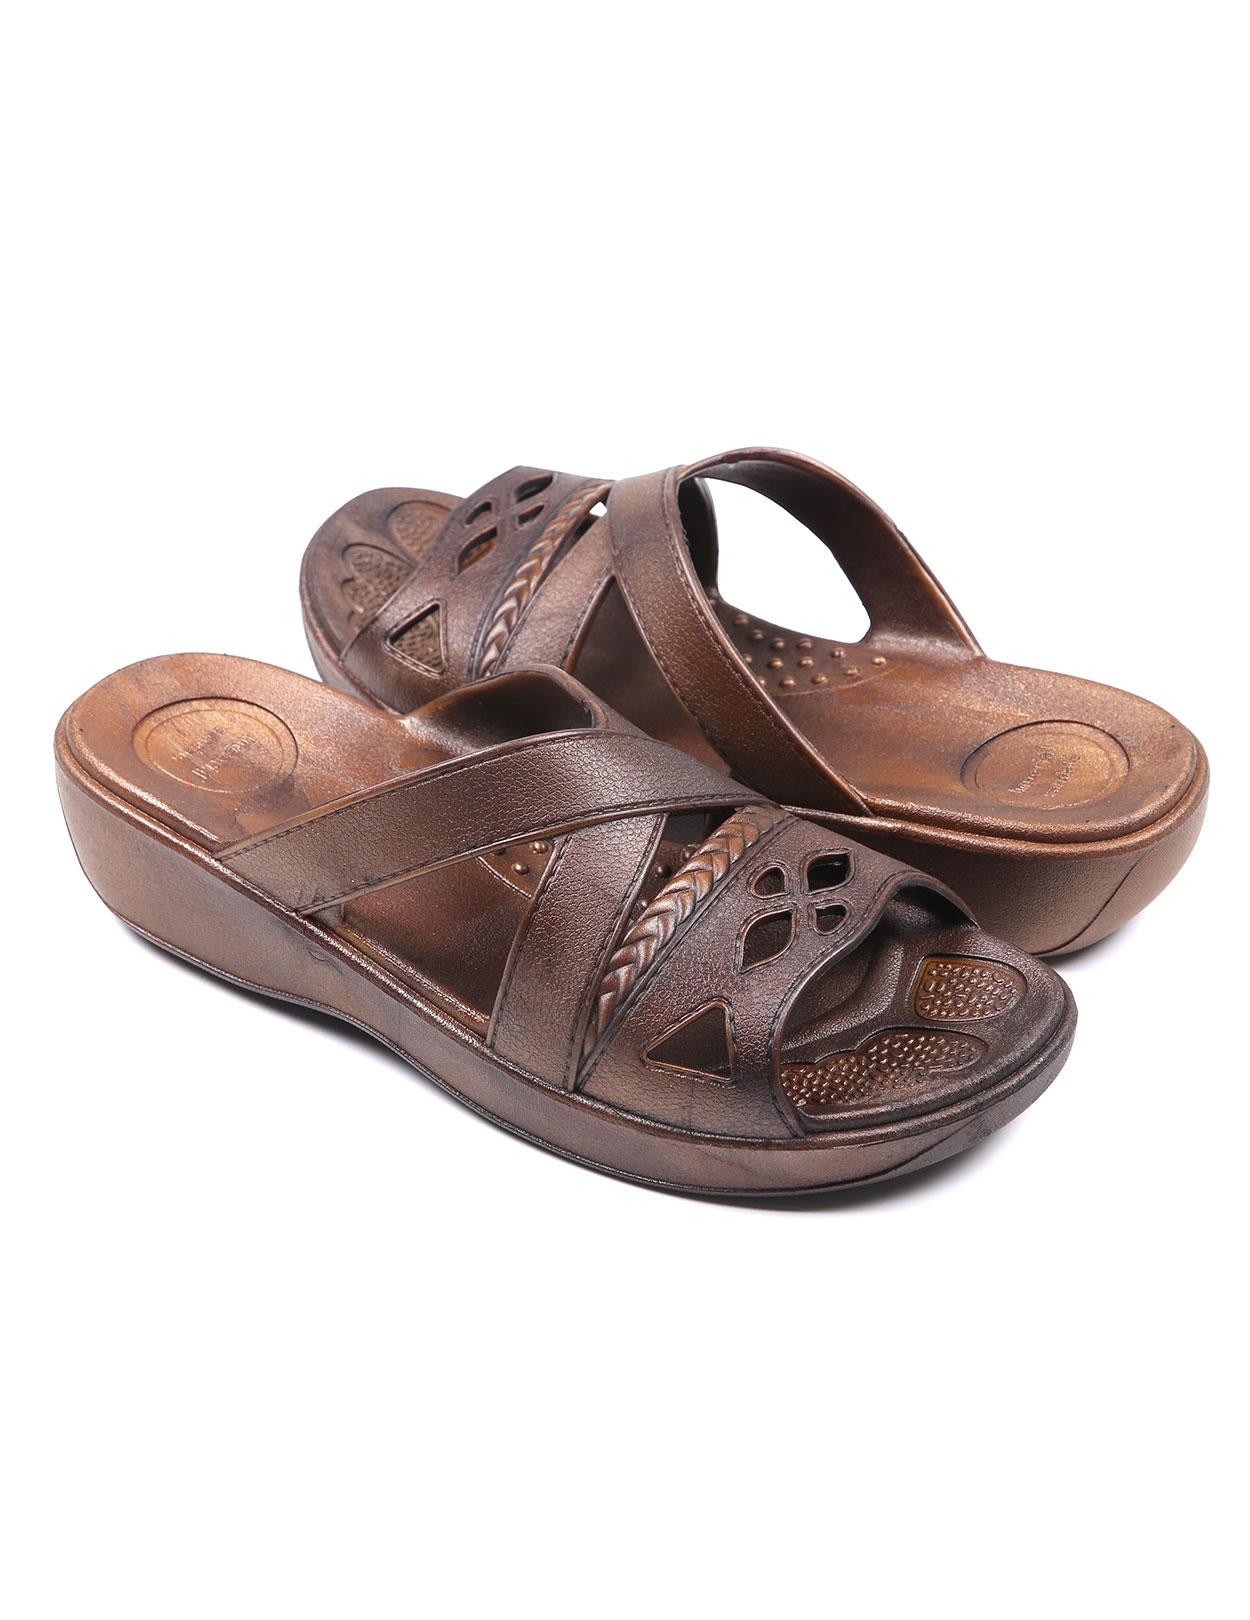 best loved buy cheap no sale tax Women Jesus Sandals with Heel